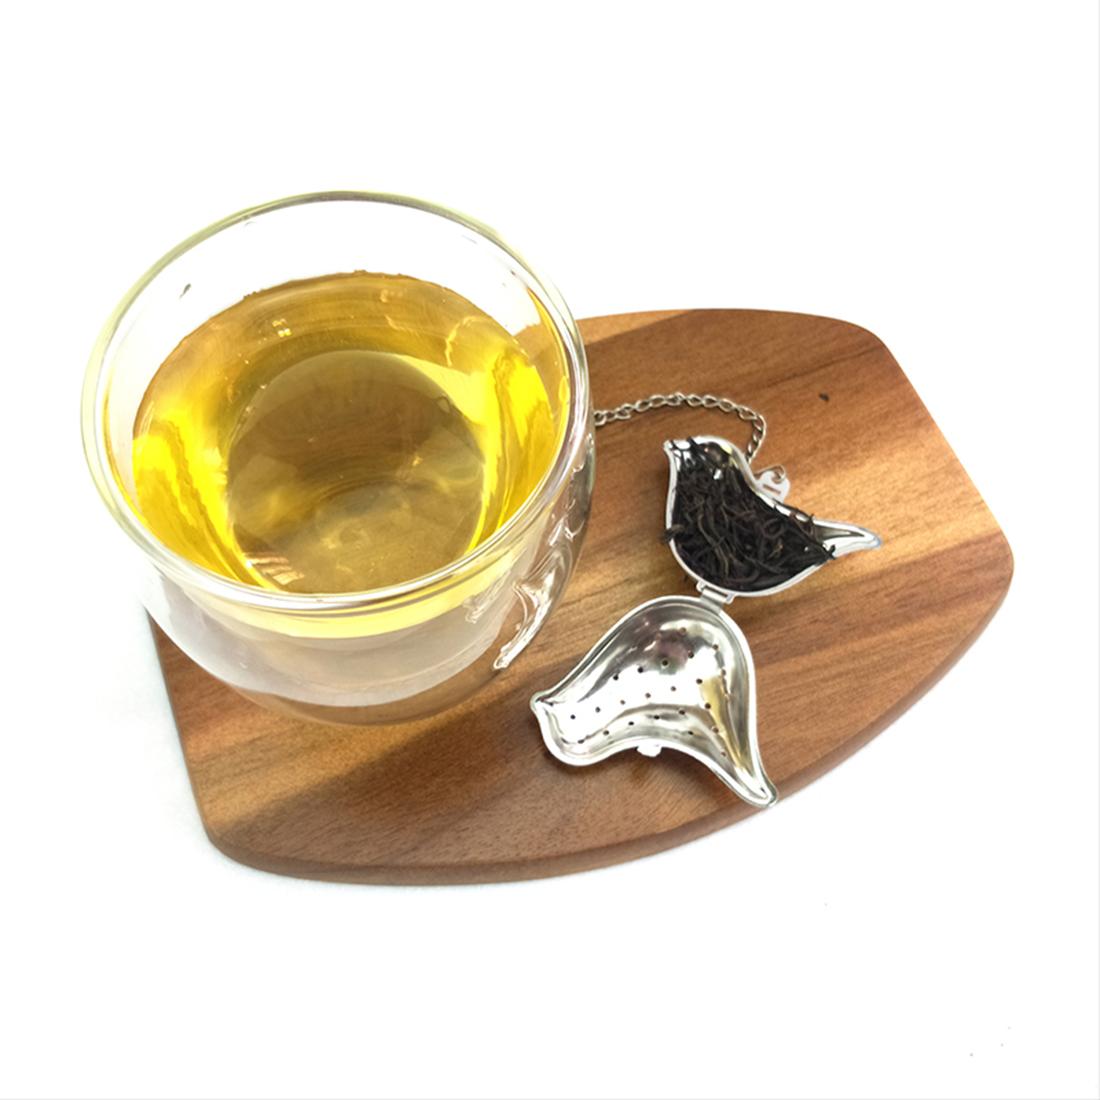 Stainless Steel Animal Shape Tea Filter